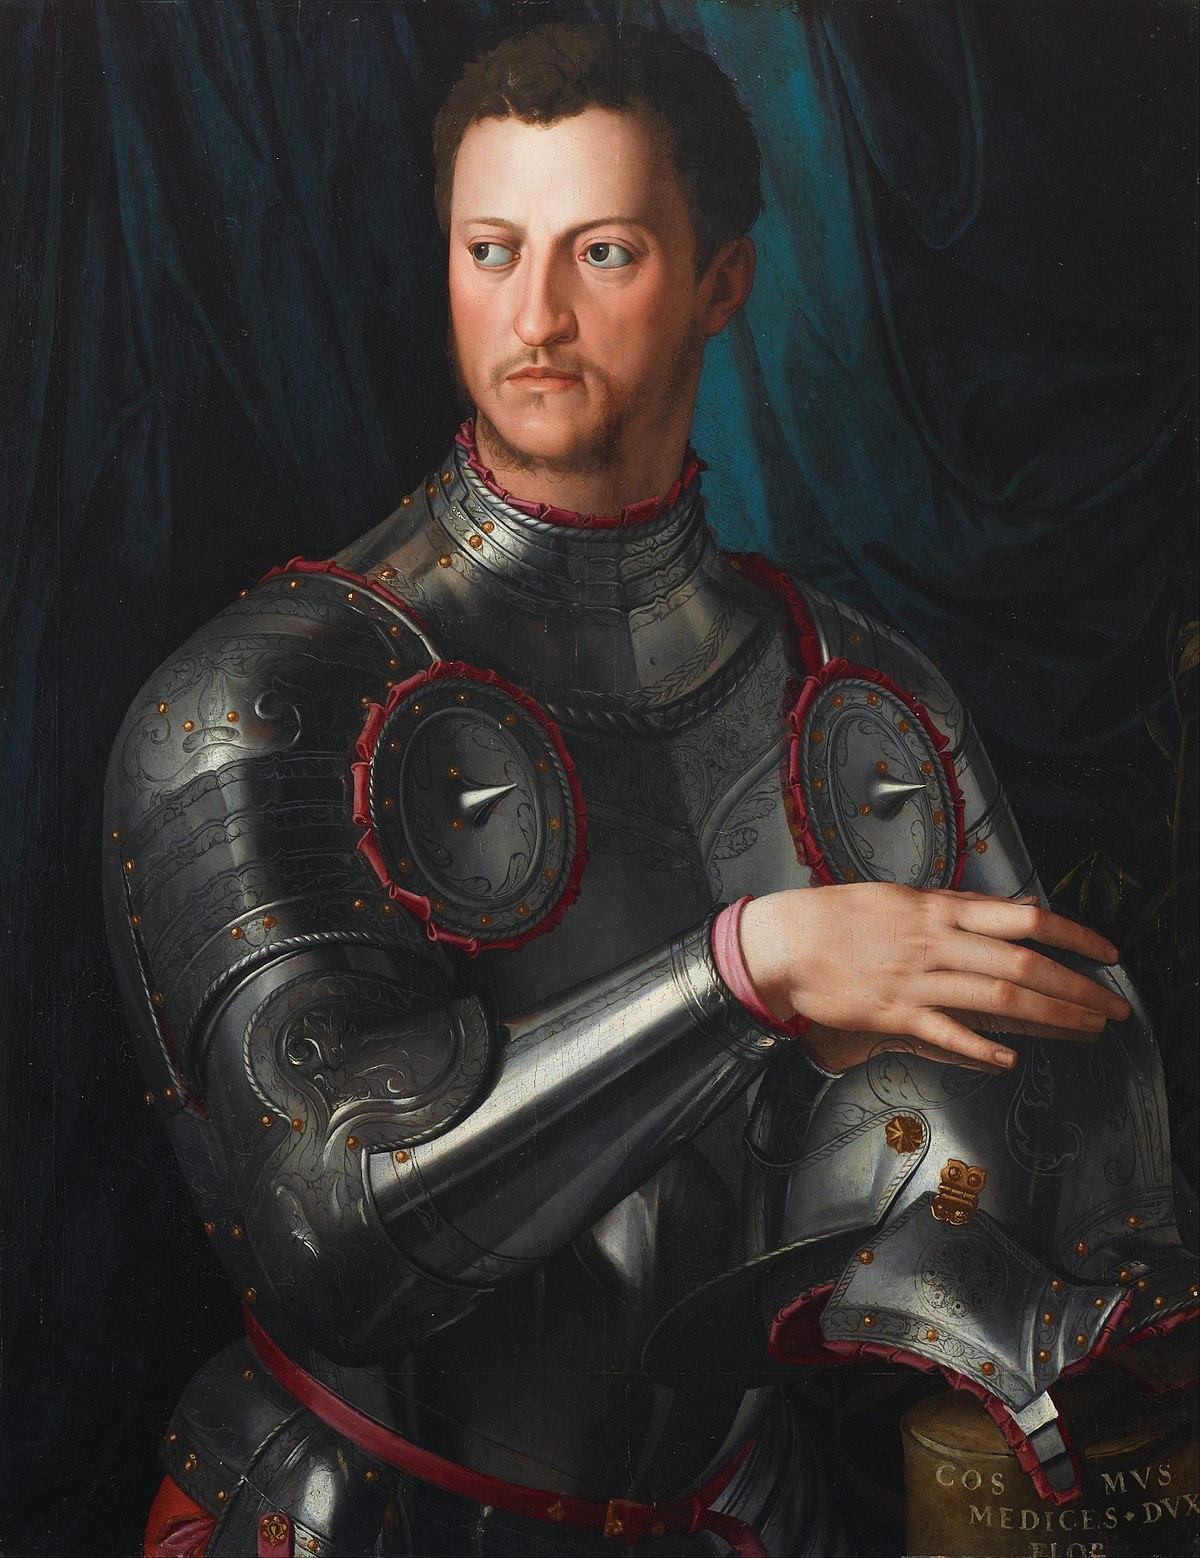 Agnolo Bronzino - Cosimo I de' Medici in armour - Google Art Project.jpg